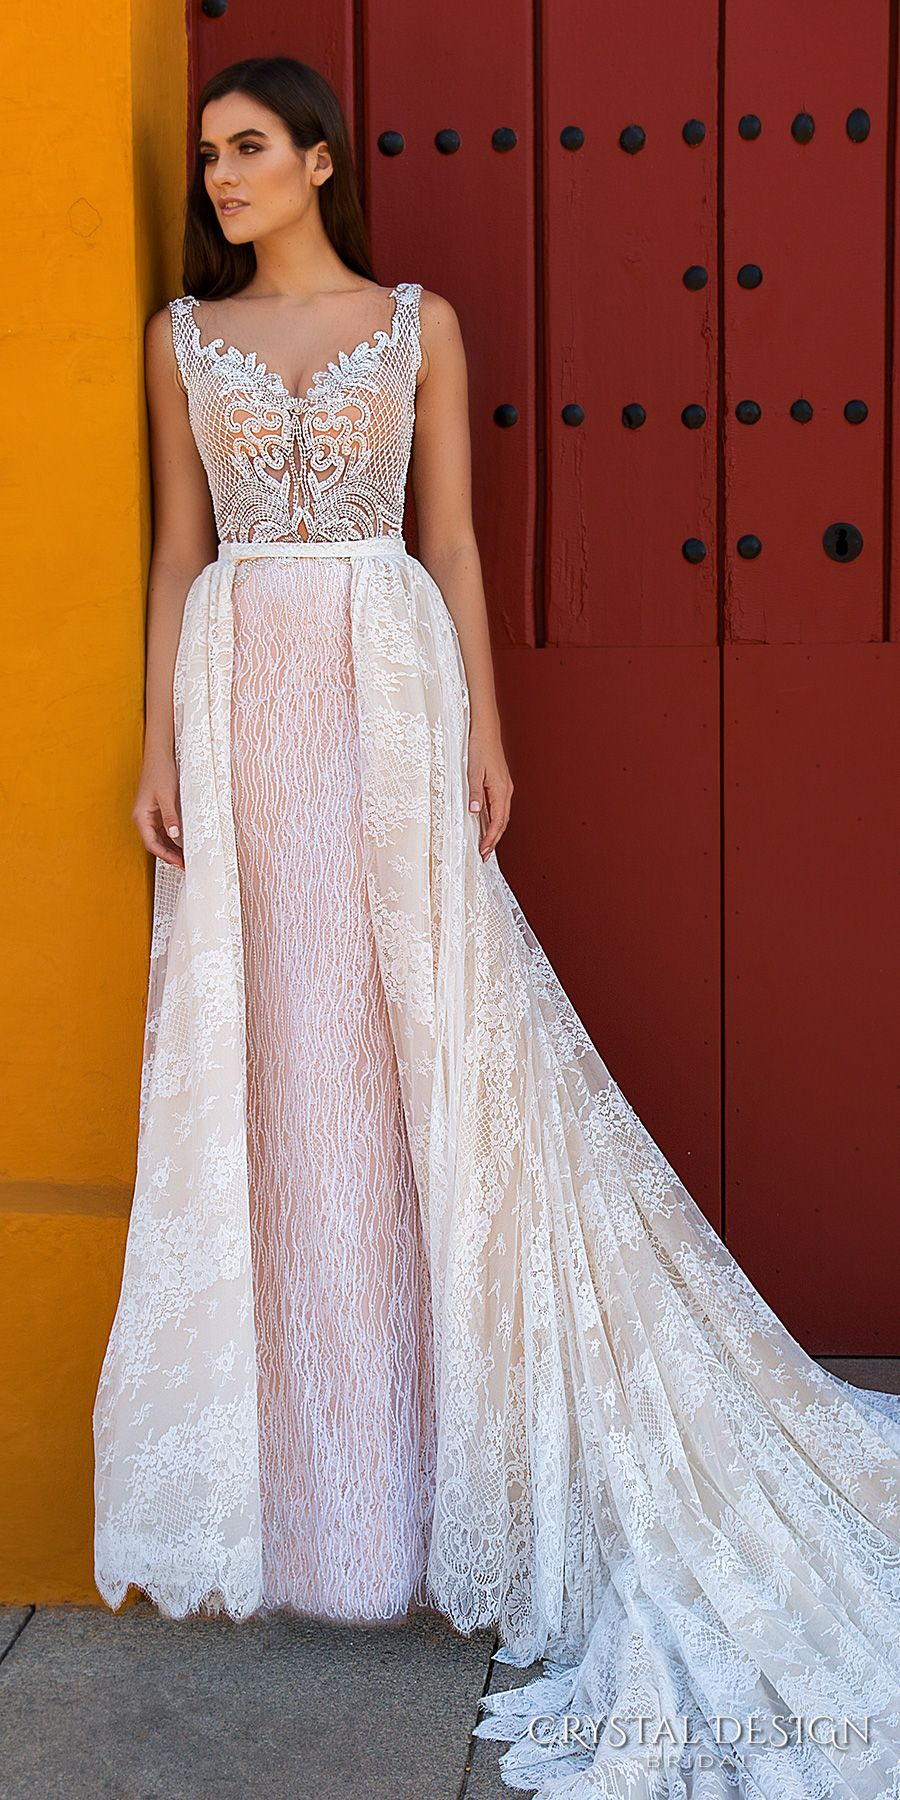 4751370d3d77 Crystal Design 2017 bridal sleeveless with strap full embellishment elegant  sheath wedding dress a line overskirt lace back royal train (eliza) mv  #wedding ...